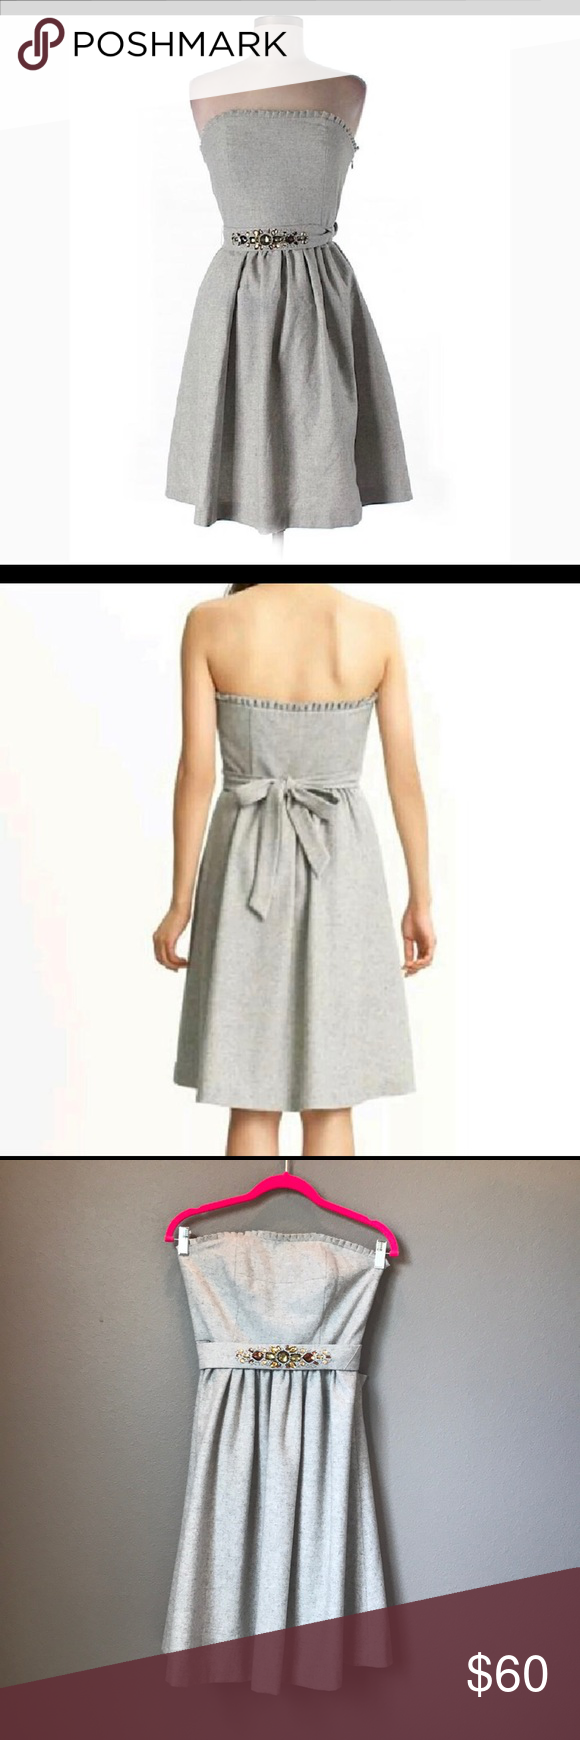 e90f1c198838d Banana Republic Strapless Wool Dress LIKE NEW! Banana Republic Strapless  Wool Dress with Jeweled Belt - Size 2 - This dress is BEAUTIFUL!